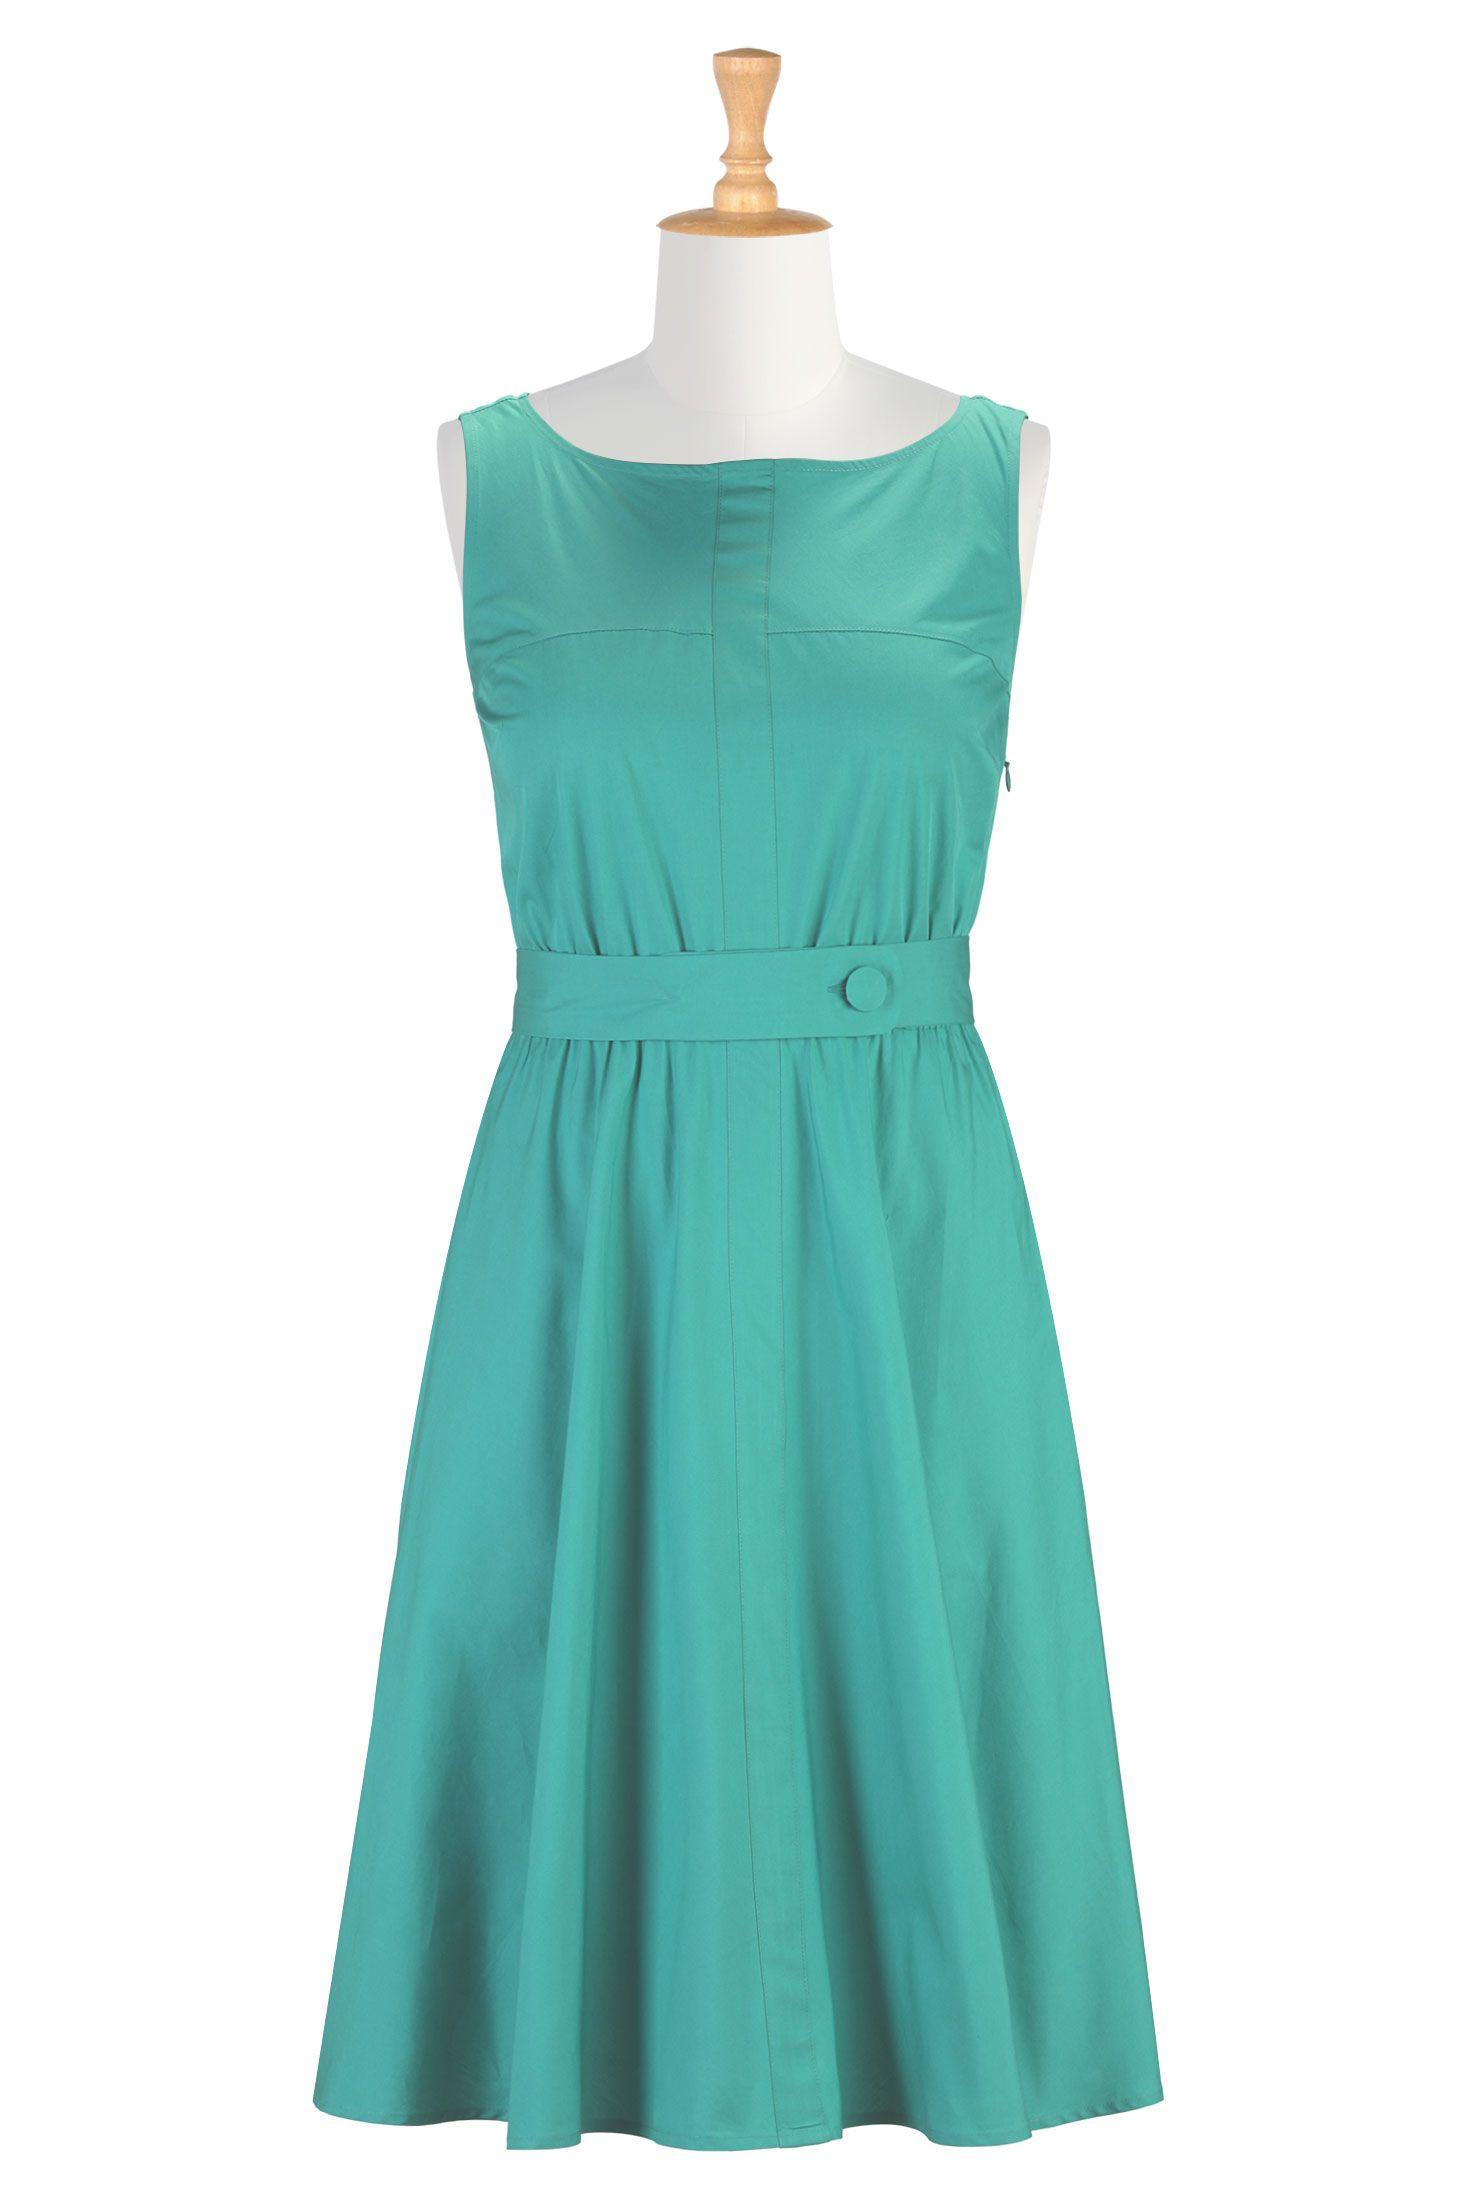 Daytime Dresses Plus Size, Solid-Color Dresses Shop womens fashion design - Designer Fashion - Women's designer clothes and more | eShakti.com